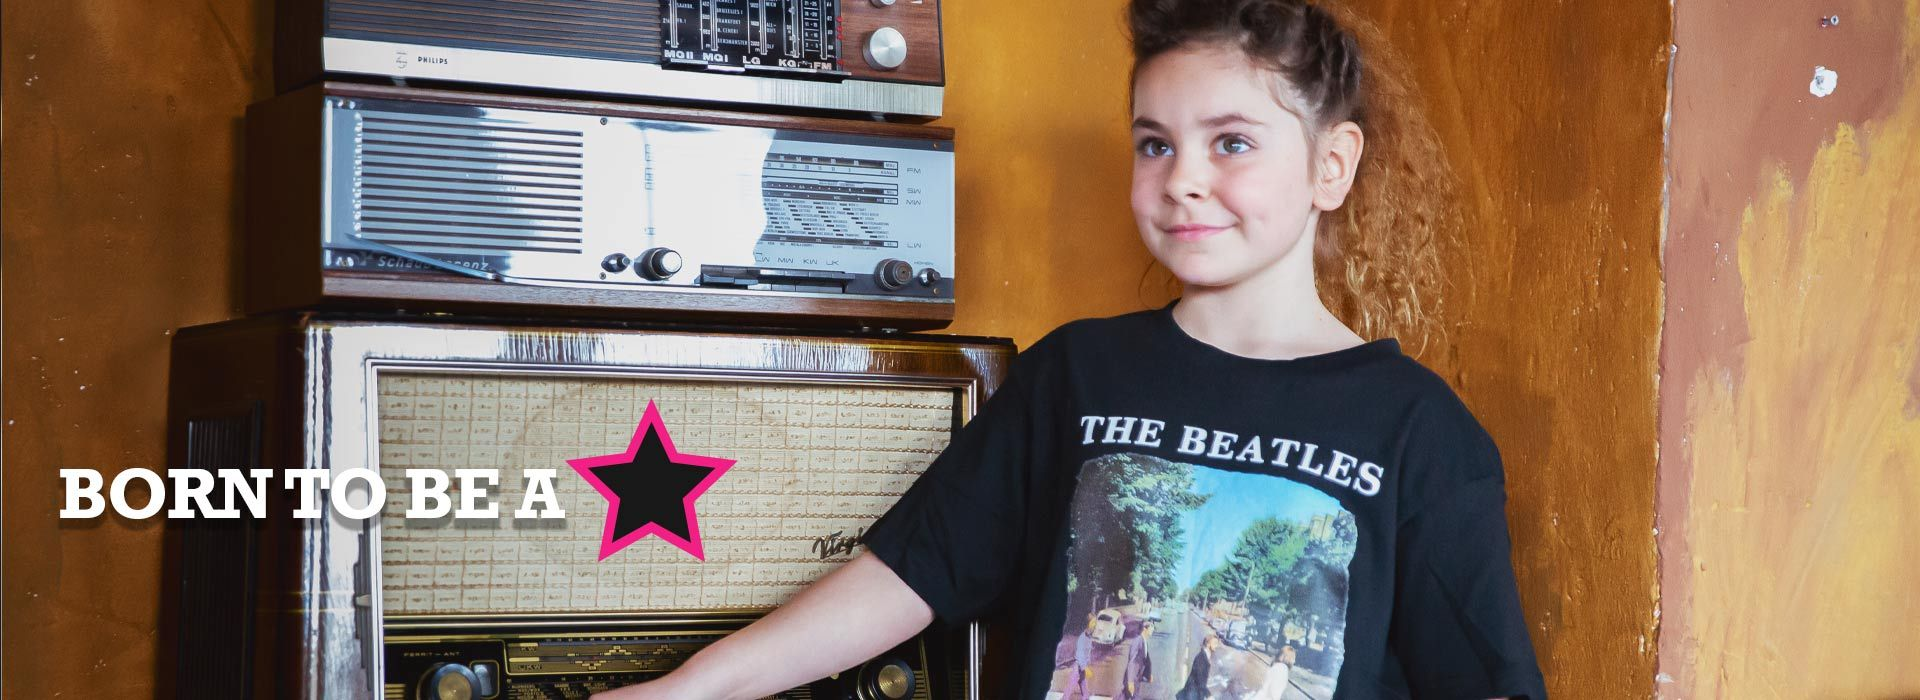 Rock bebe t-shirt - The Beatles